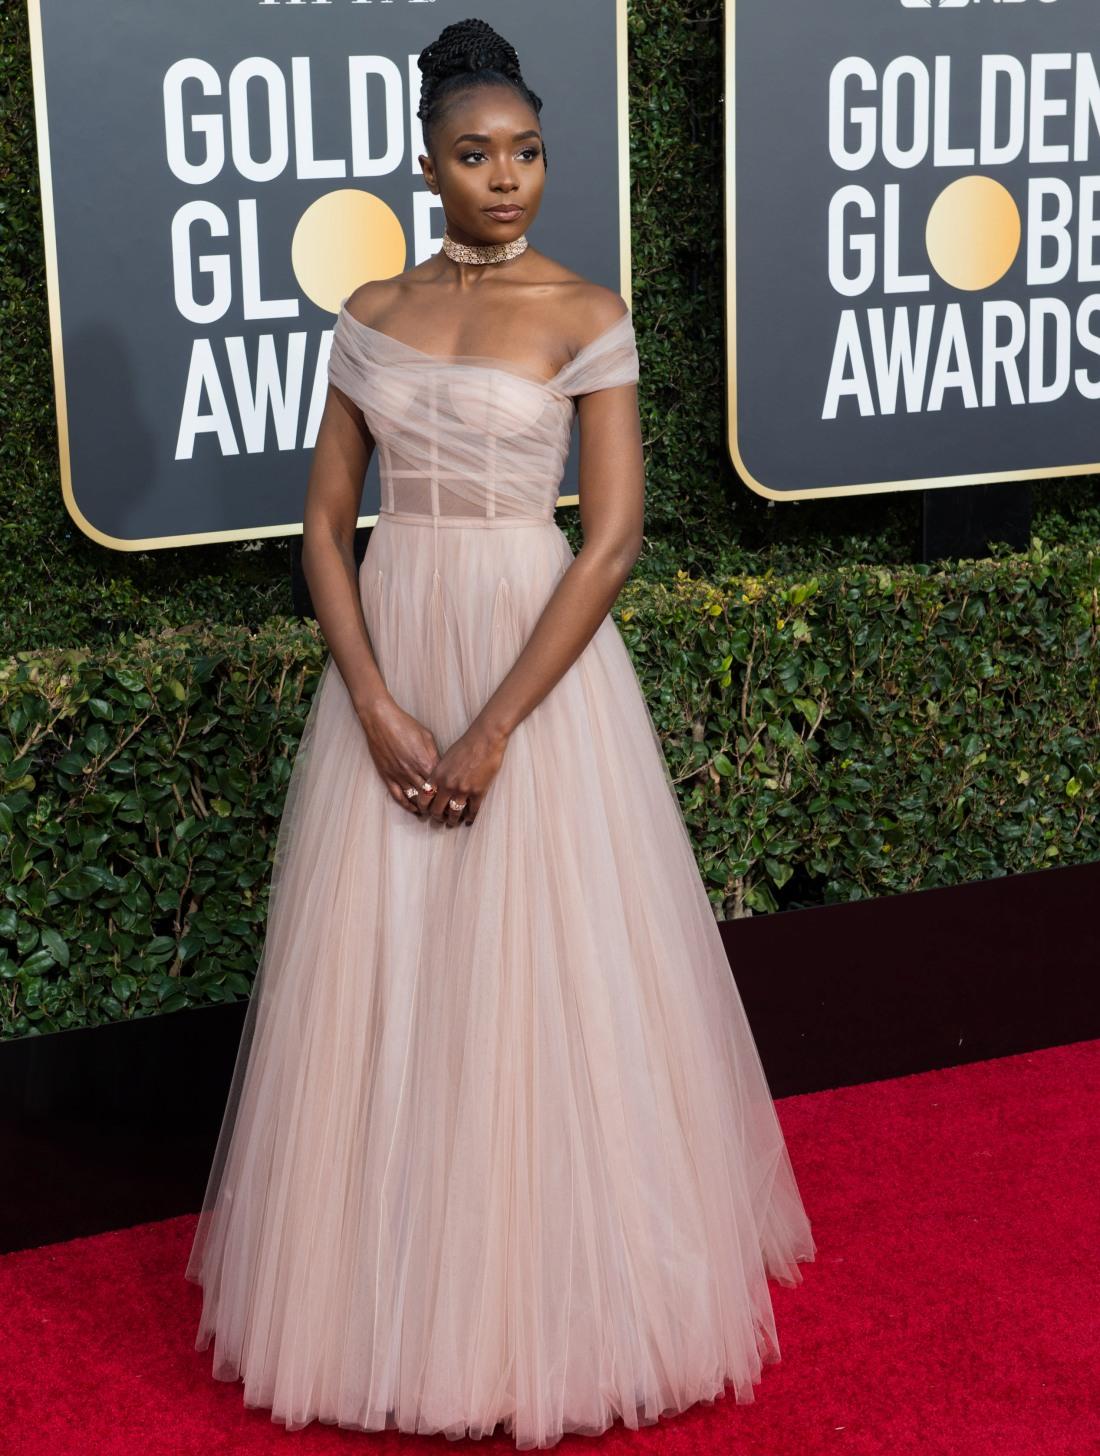 76th Annual Golden Globe Awards - 2019 Arrivals